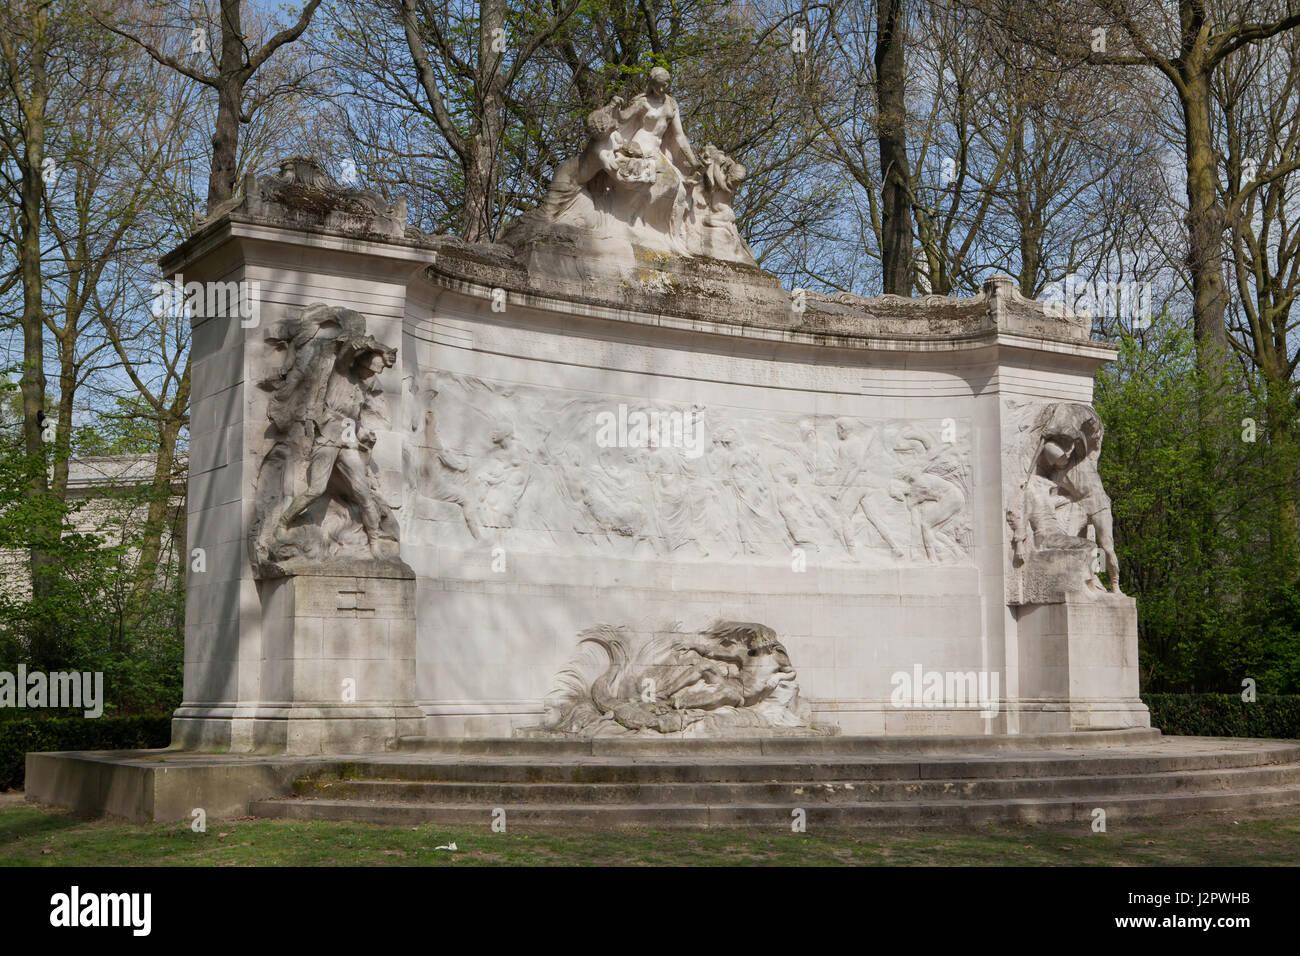 Monument to the Fallen Pioneers of Belgian Congo (Monument aux pionniers belges au Congo) by Belgian sculptor Thomas - Stock-Bilder